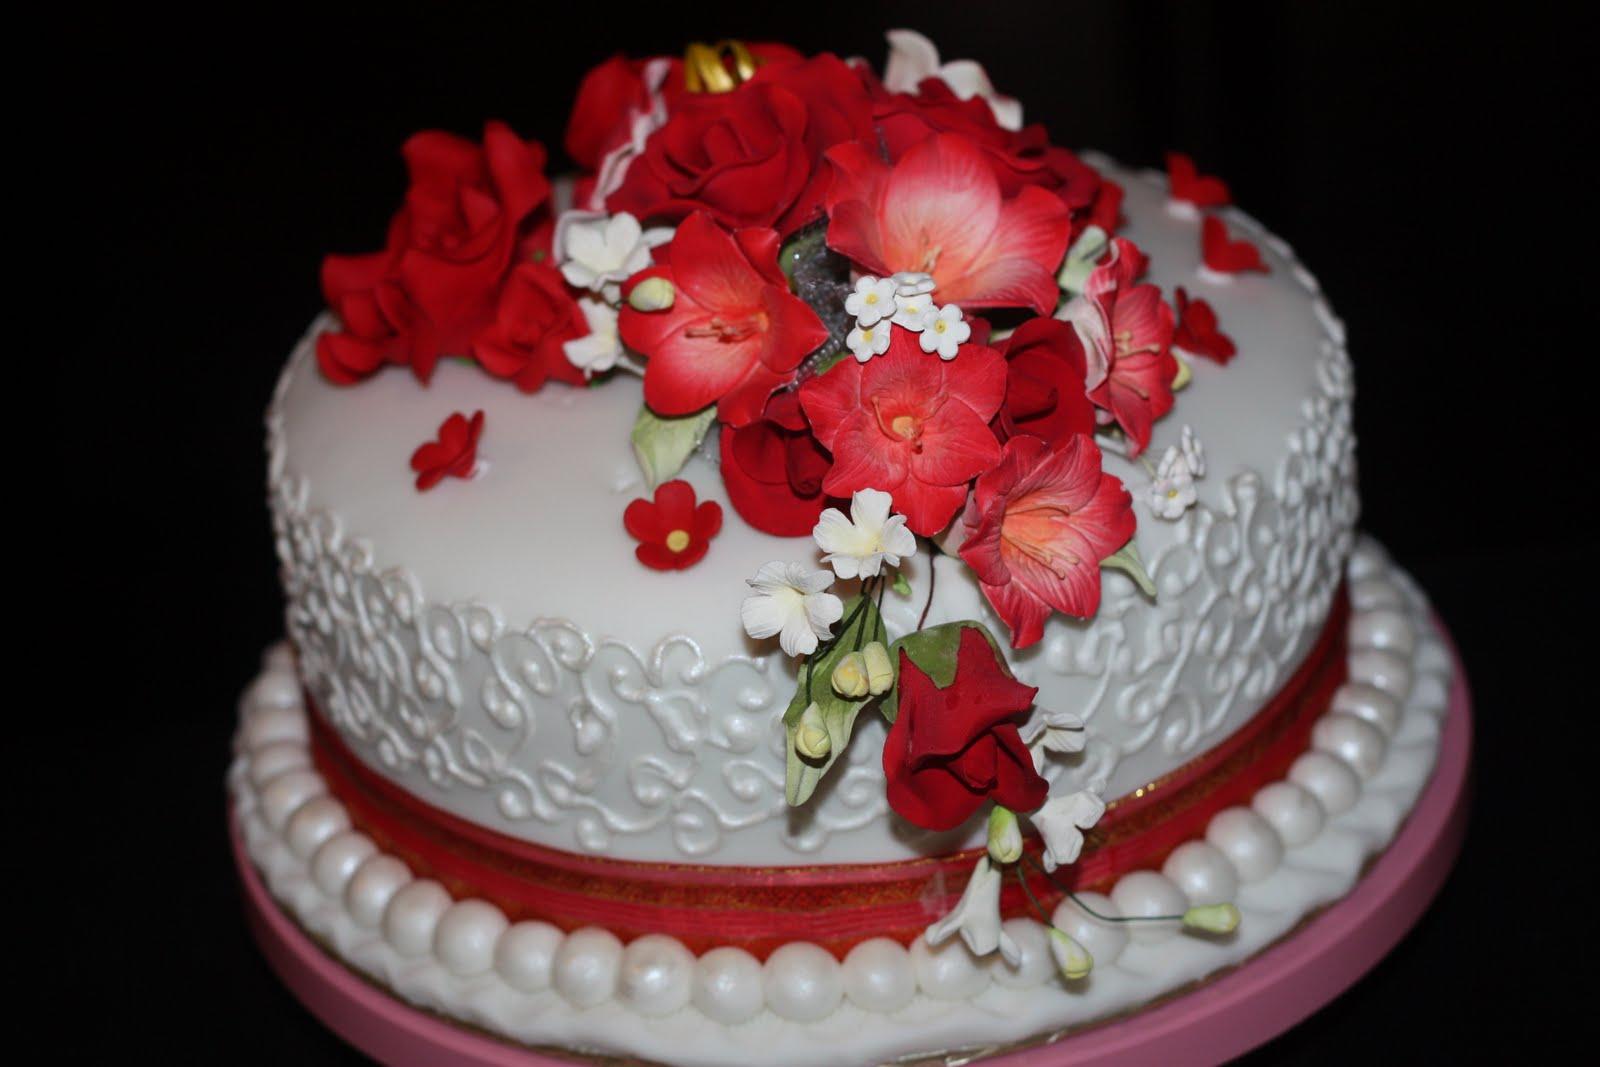 Chomel Cupcakes